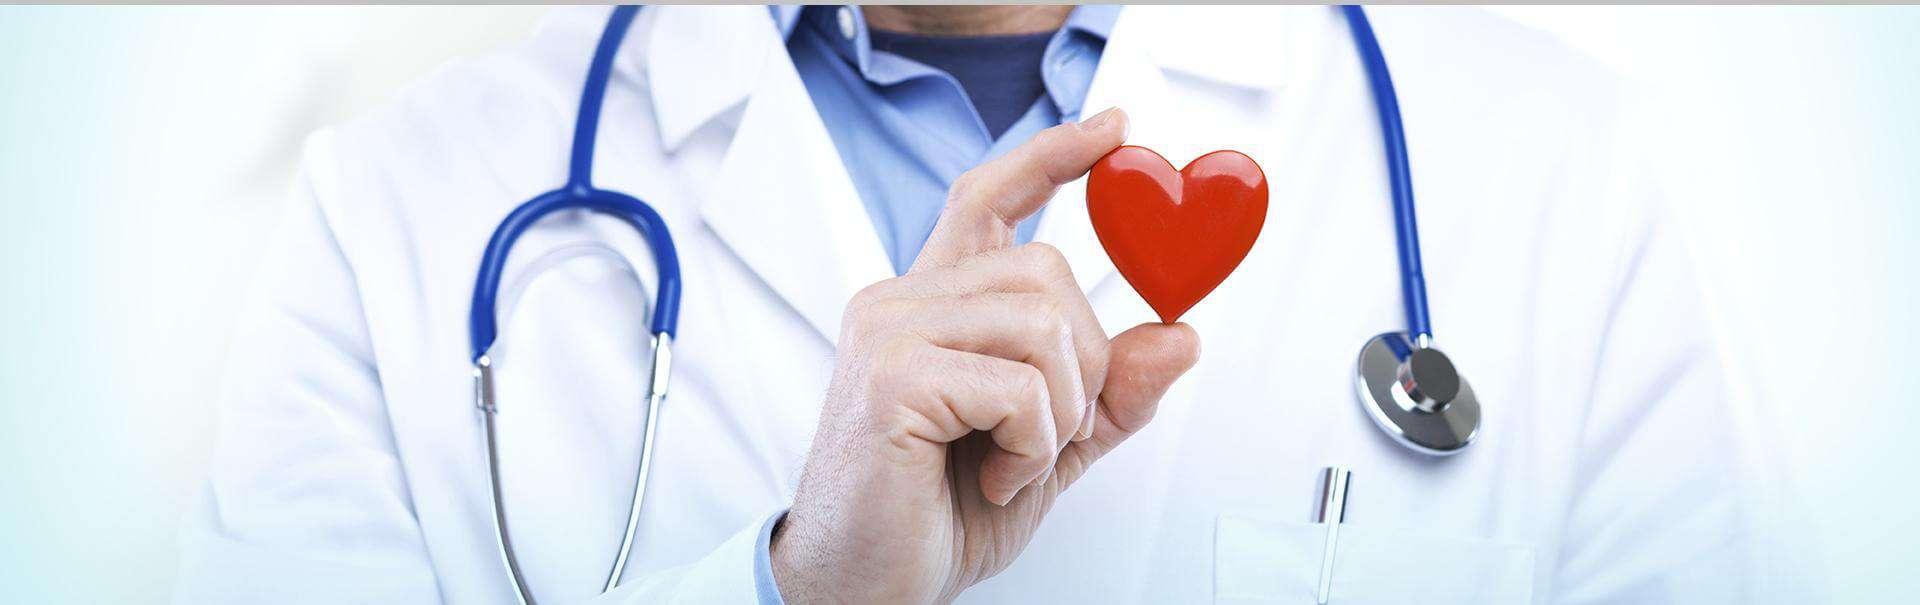 Come-diventare-Medico-cardiologo-